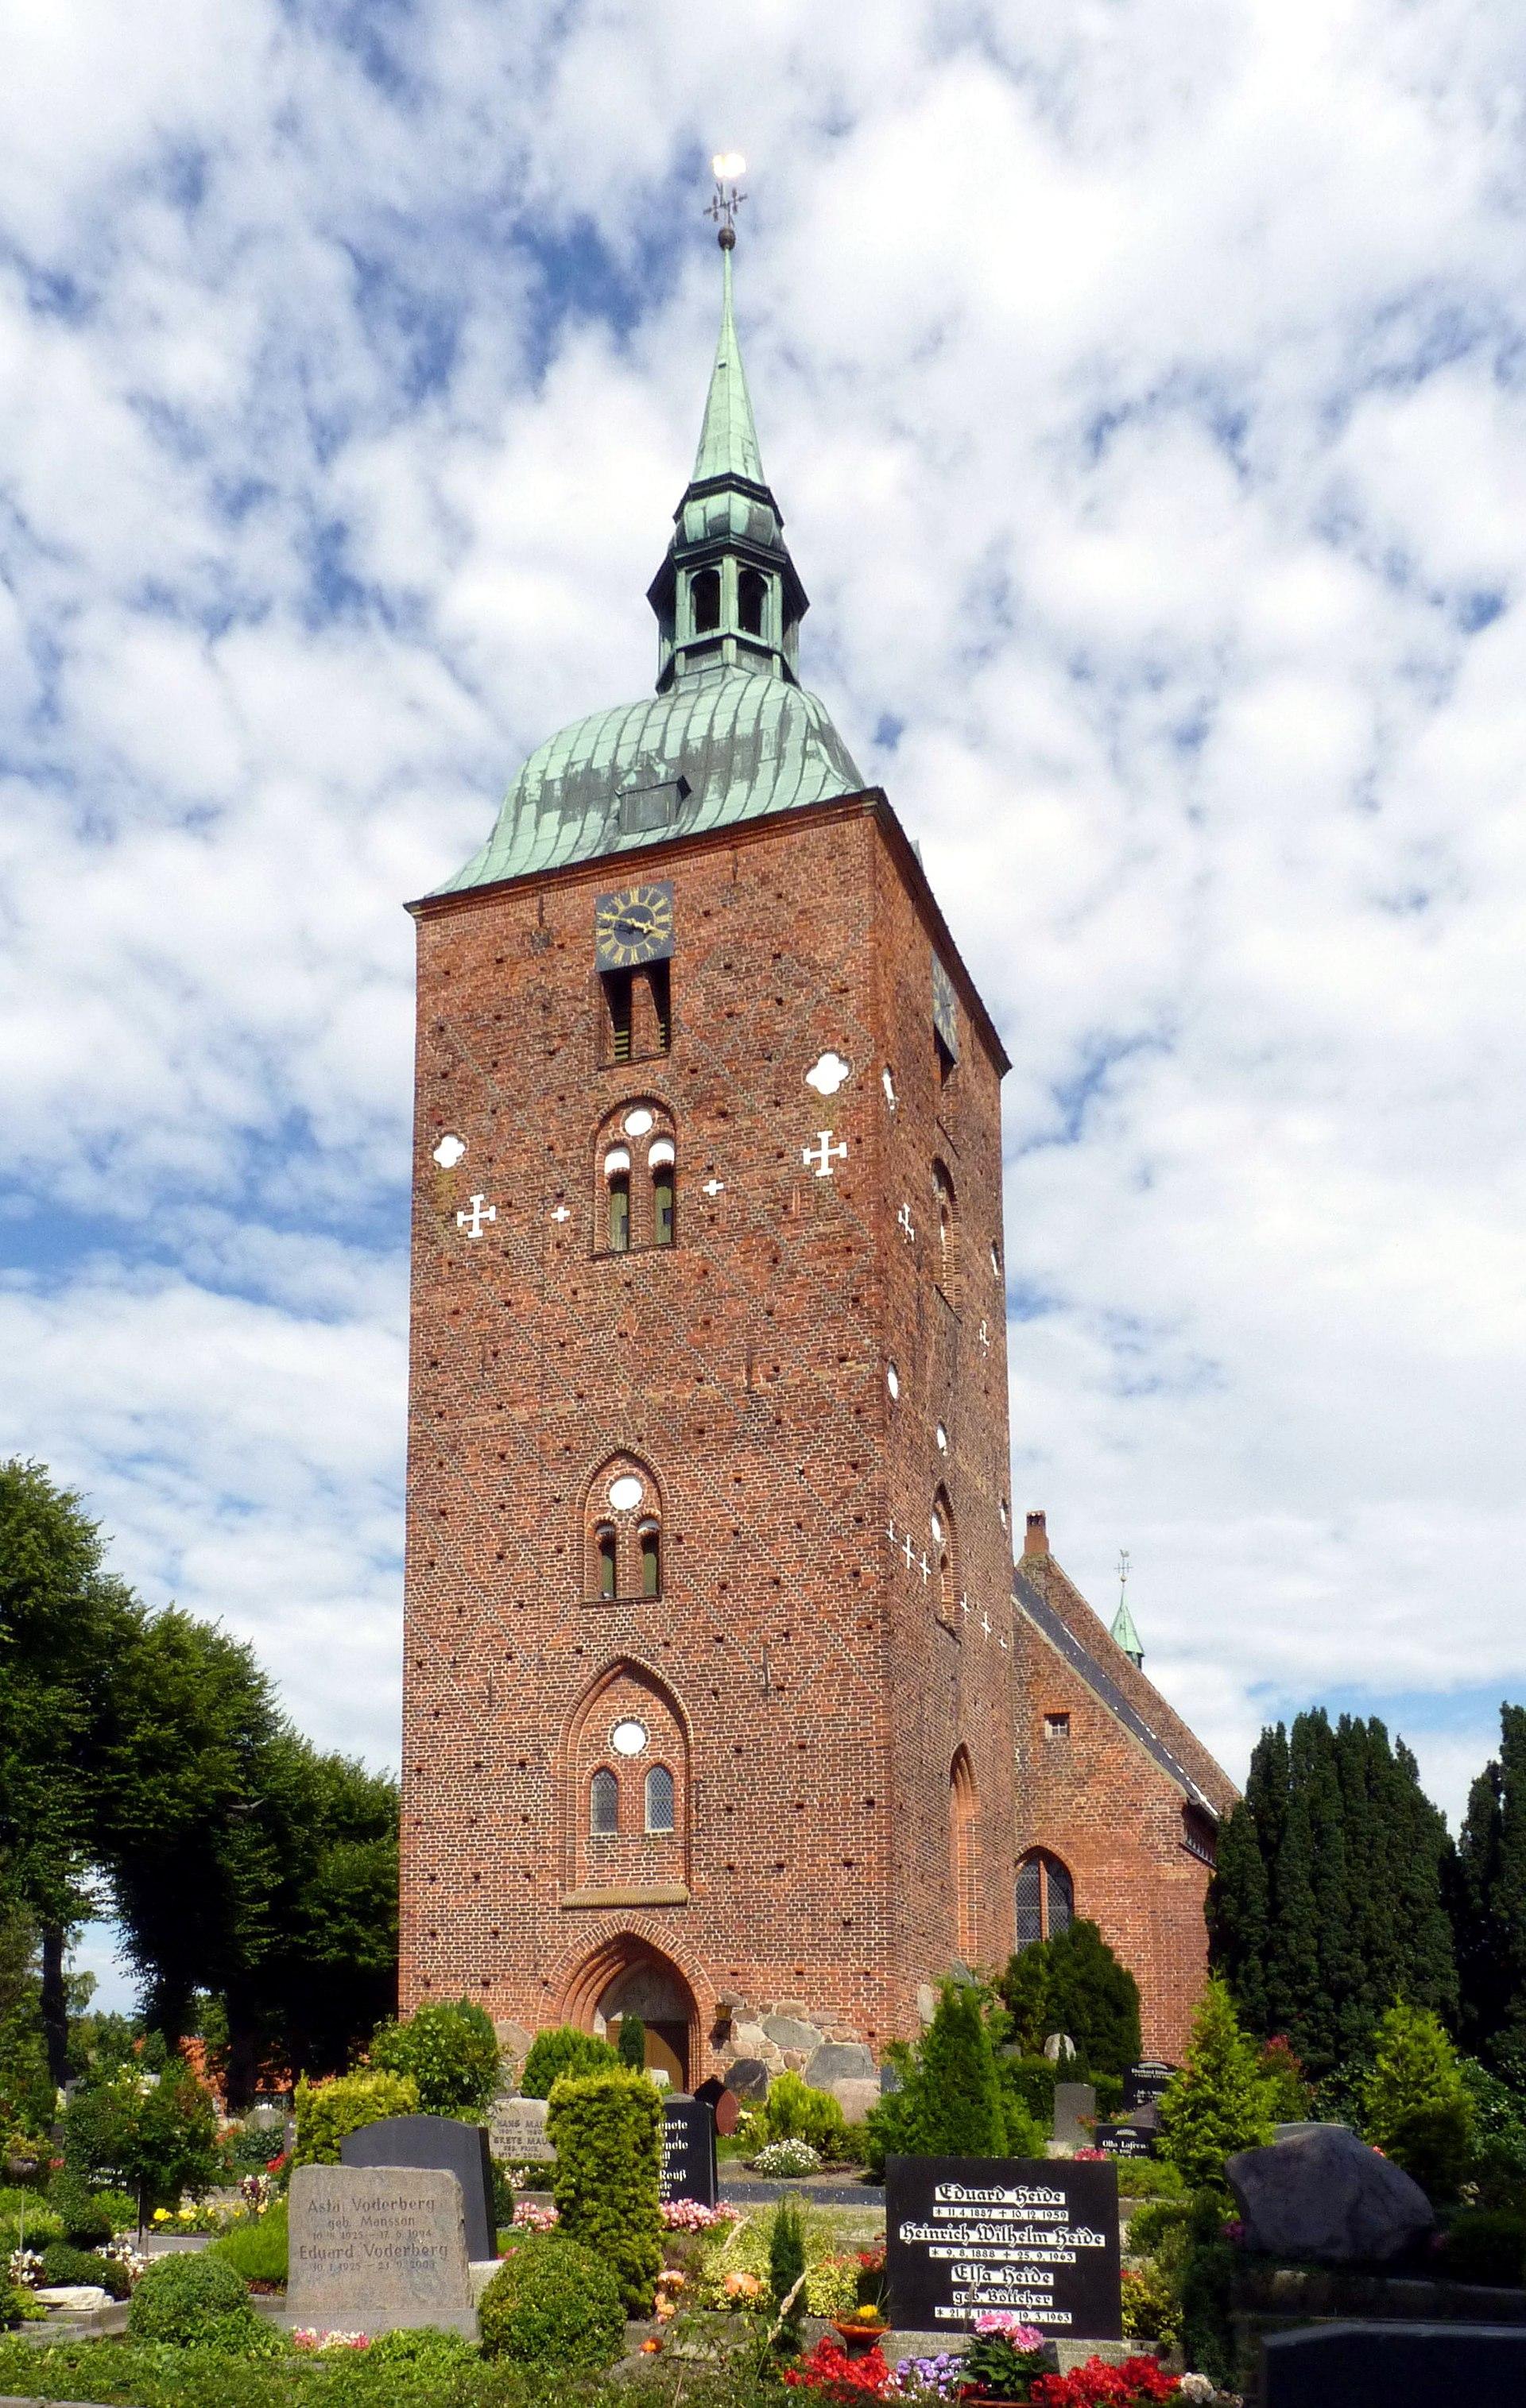 Kirche Burg Fehmarn